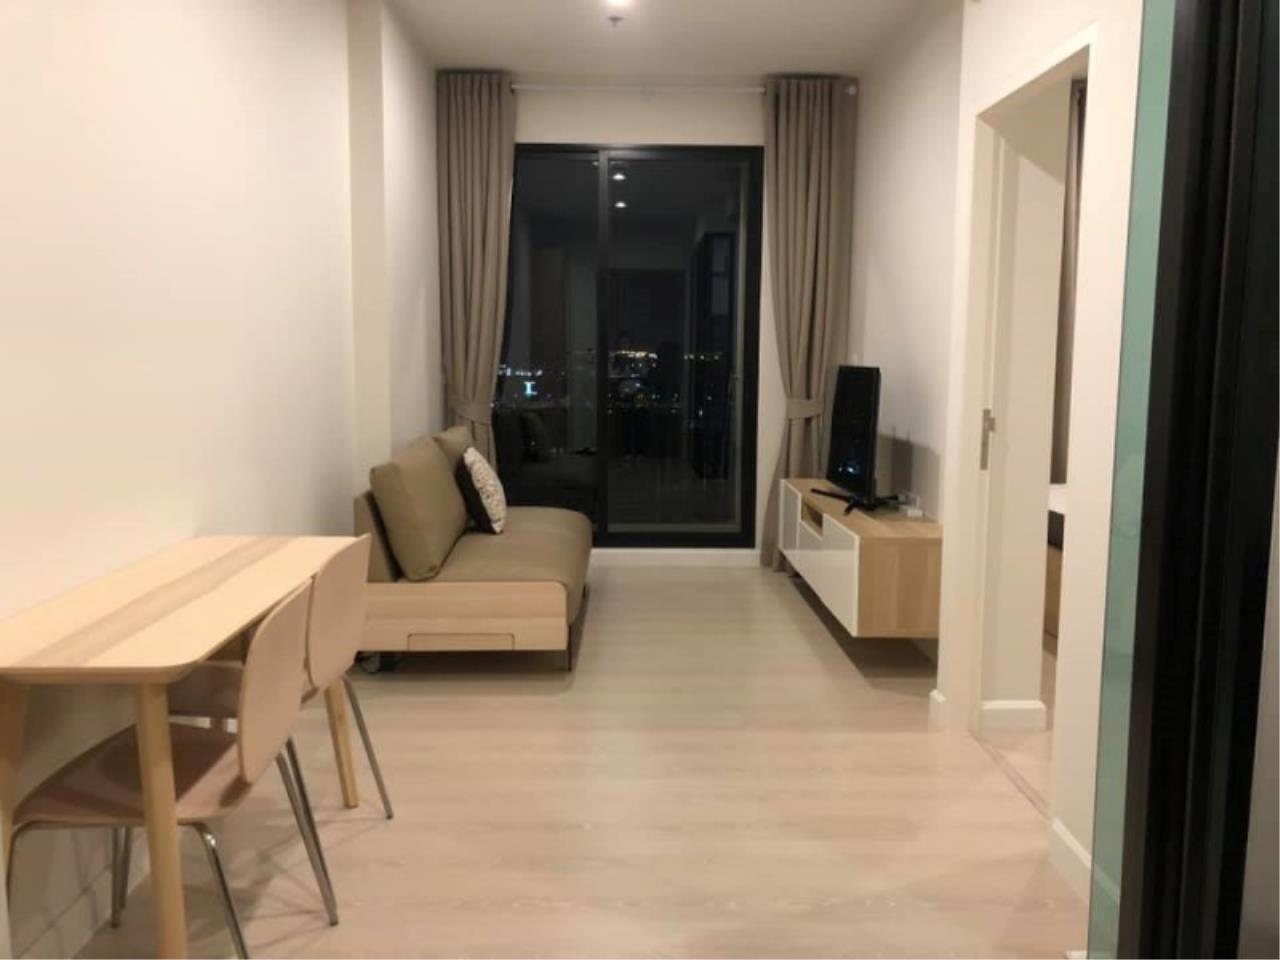 Century21 Skylux Agency's The Niche Pride Thonglor-Phetchaburi / Condo For Rent / 1 Bedroom / 35.46 SQM / MRT Phetchaburi / Bangkok 1